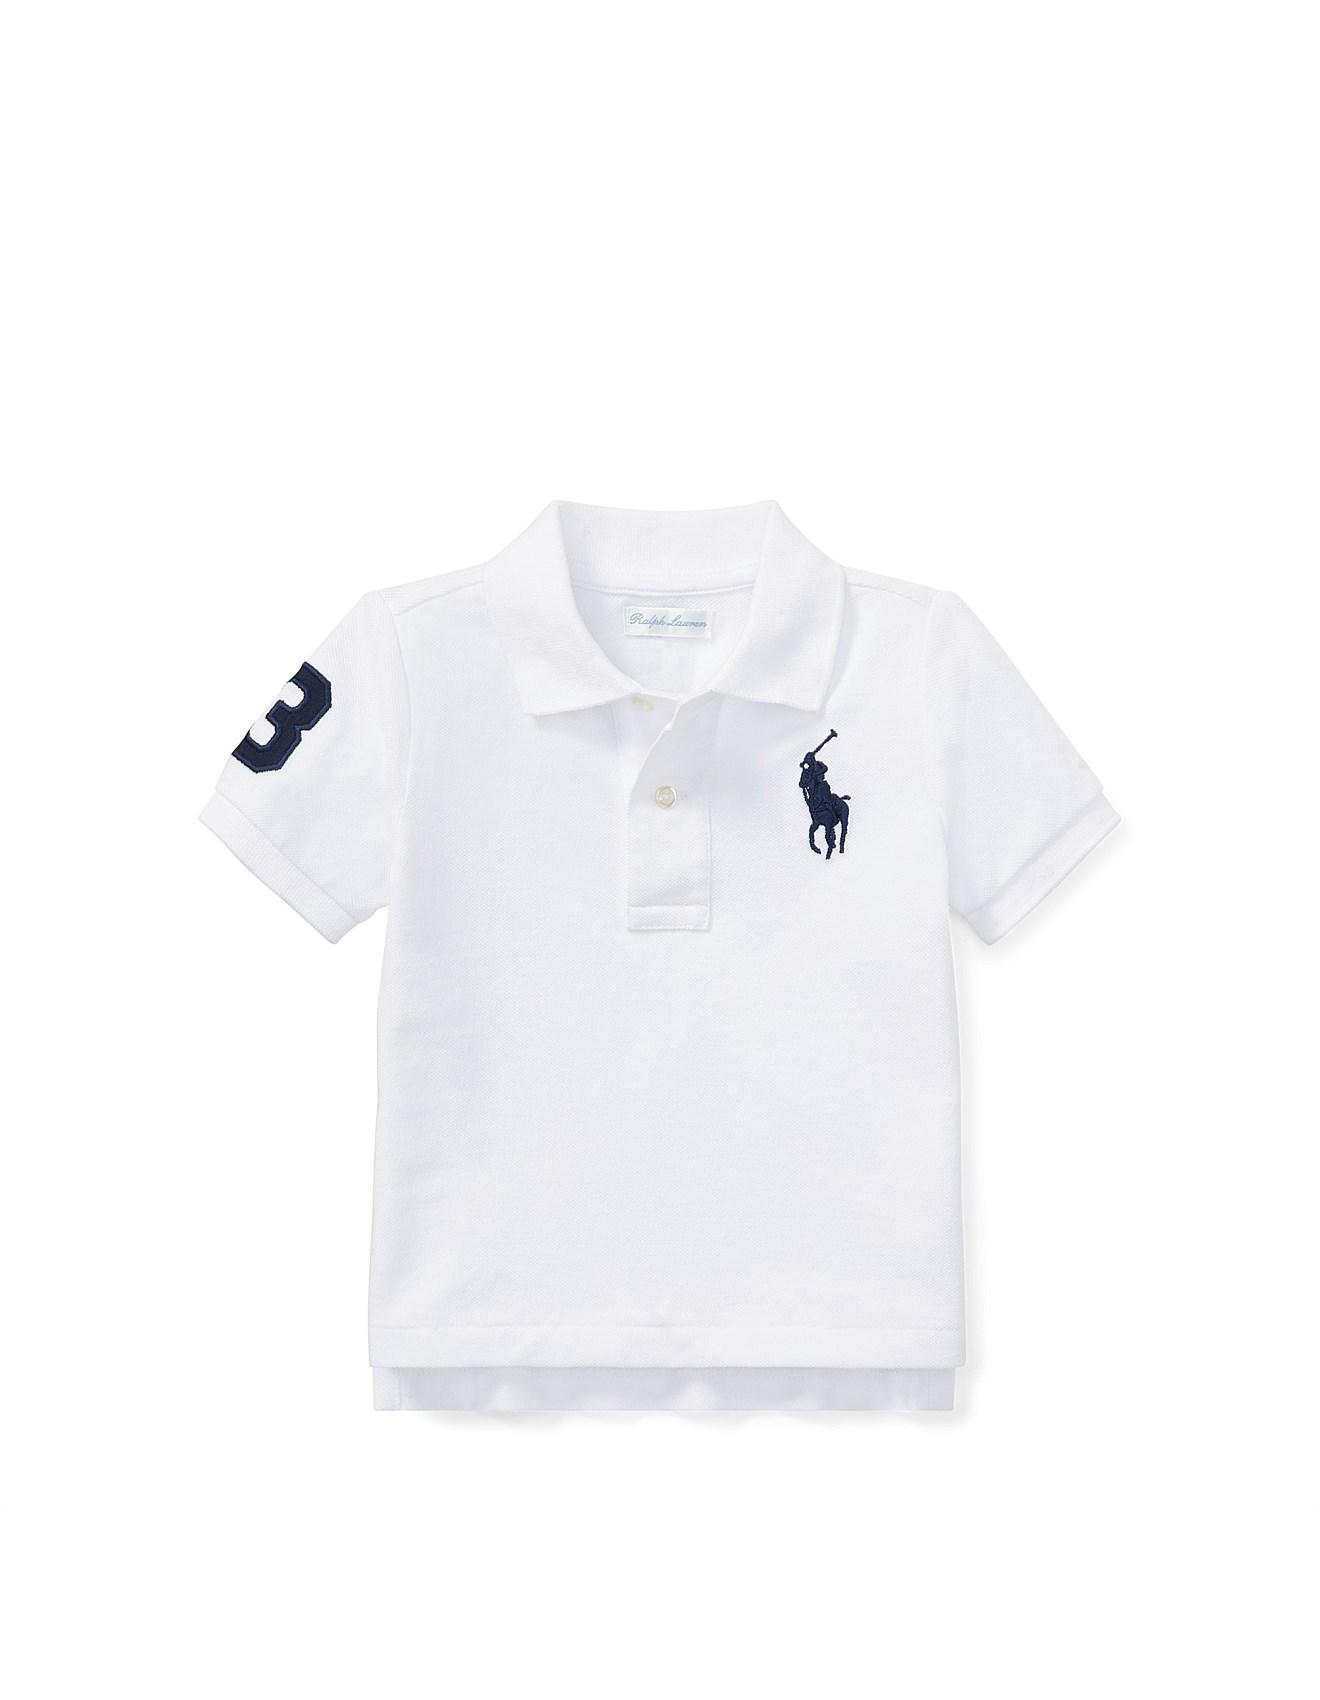 a5194dcf Baby Boy Clothing Sale | Baby Boys Clothes Online | David Jones - Cotton  Mesh Polo Shirt (6-24 Months)